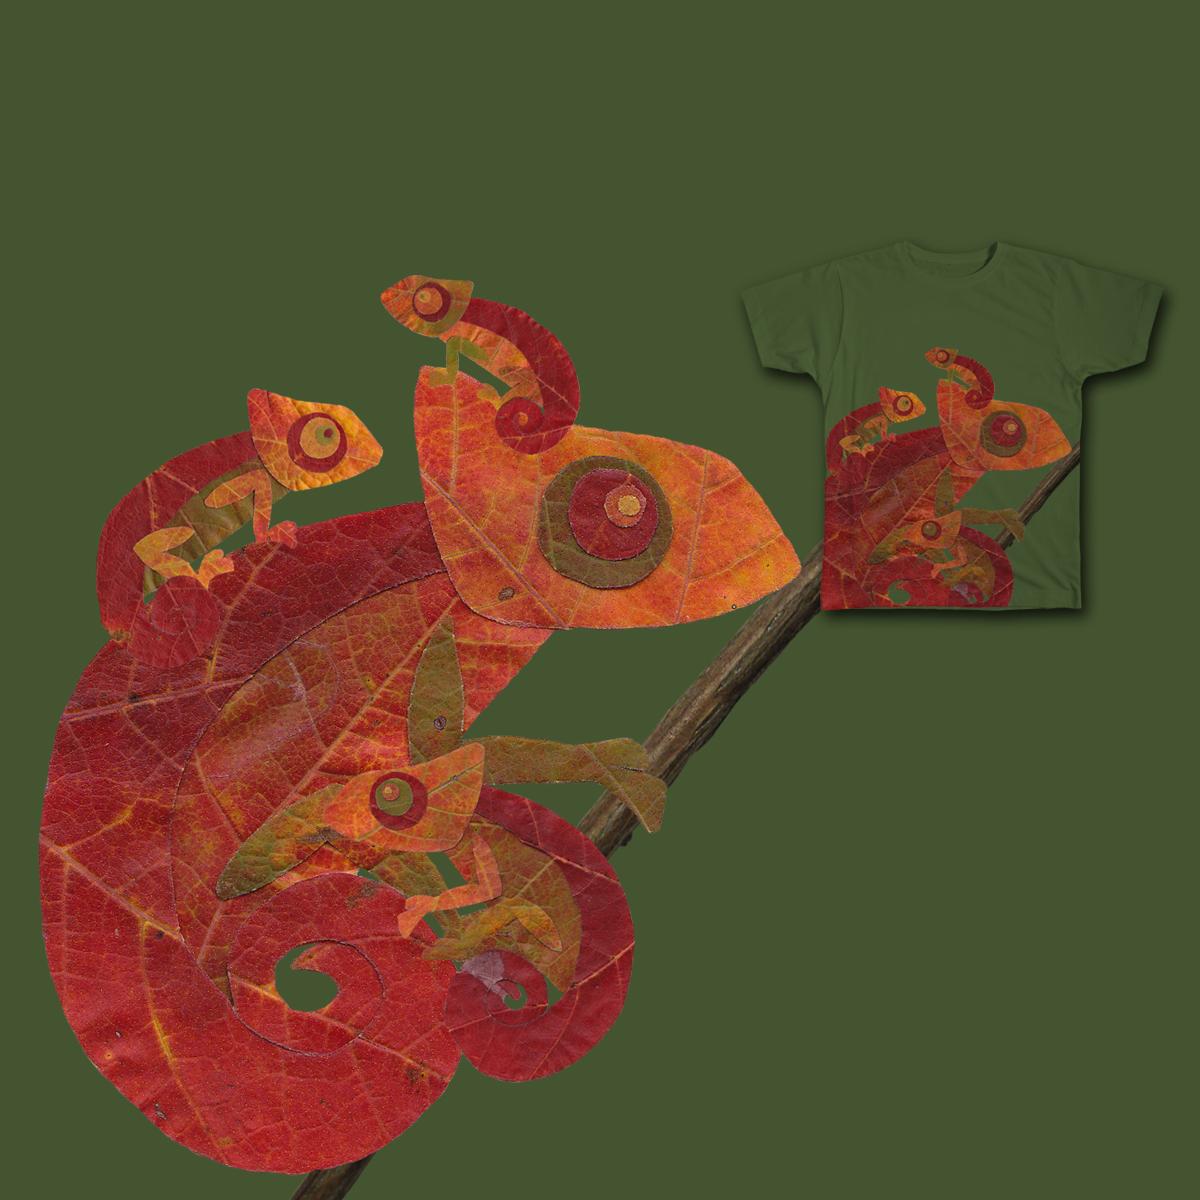 Chameleon Foliage by toru10 on Threadless